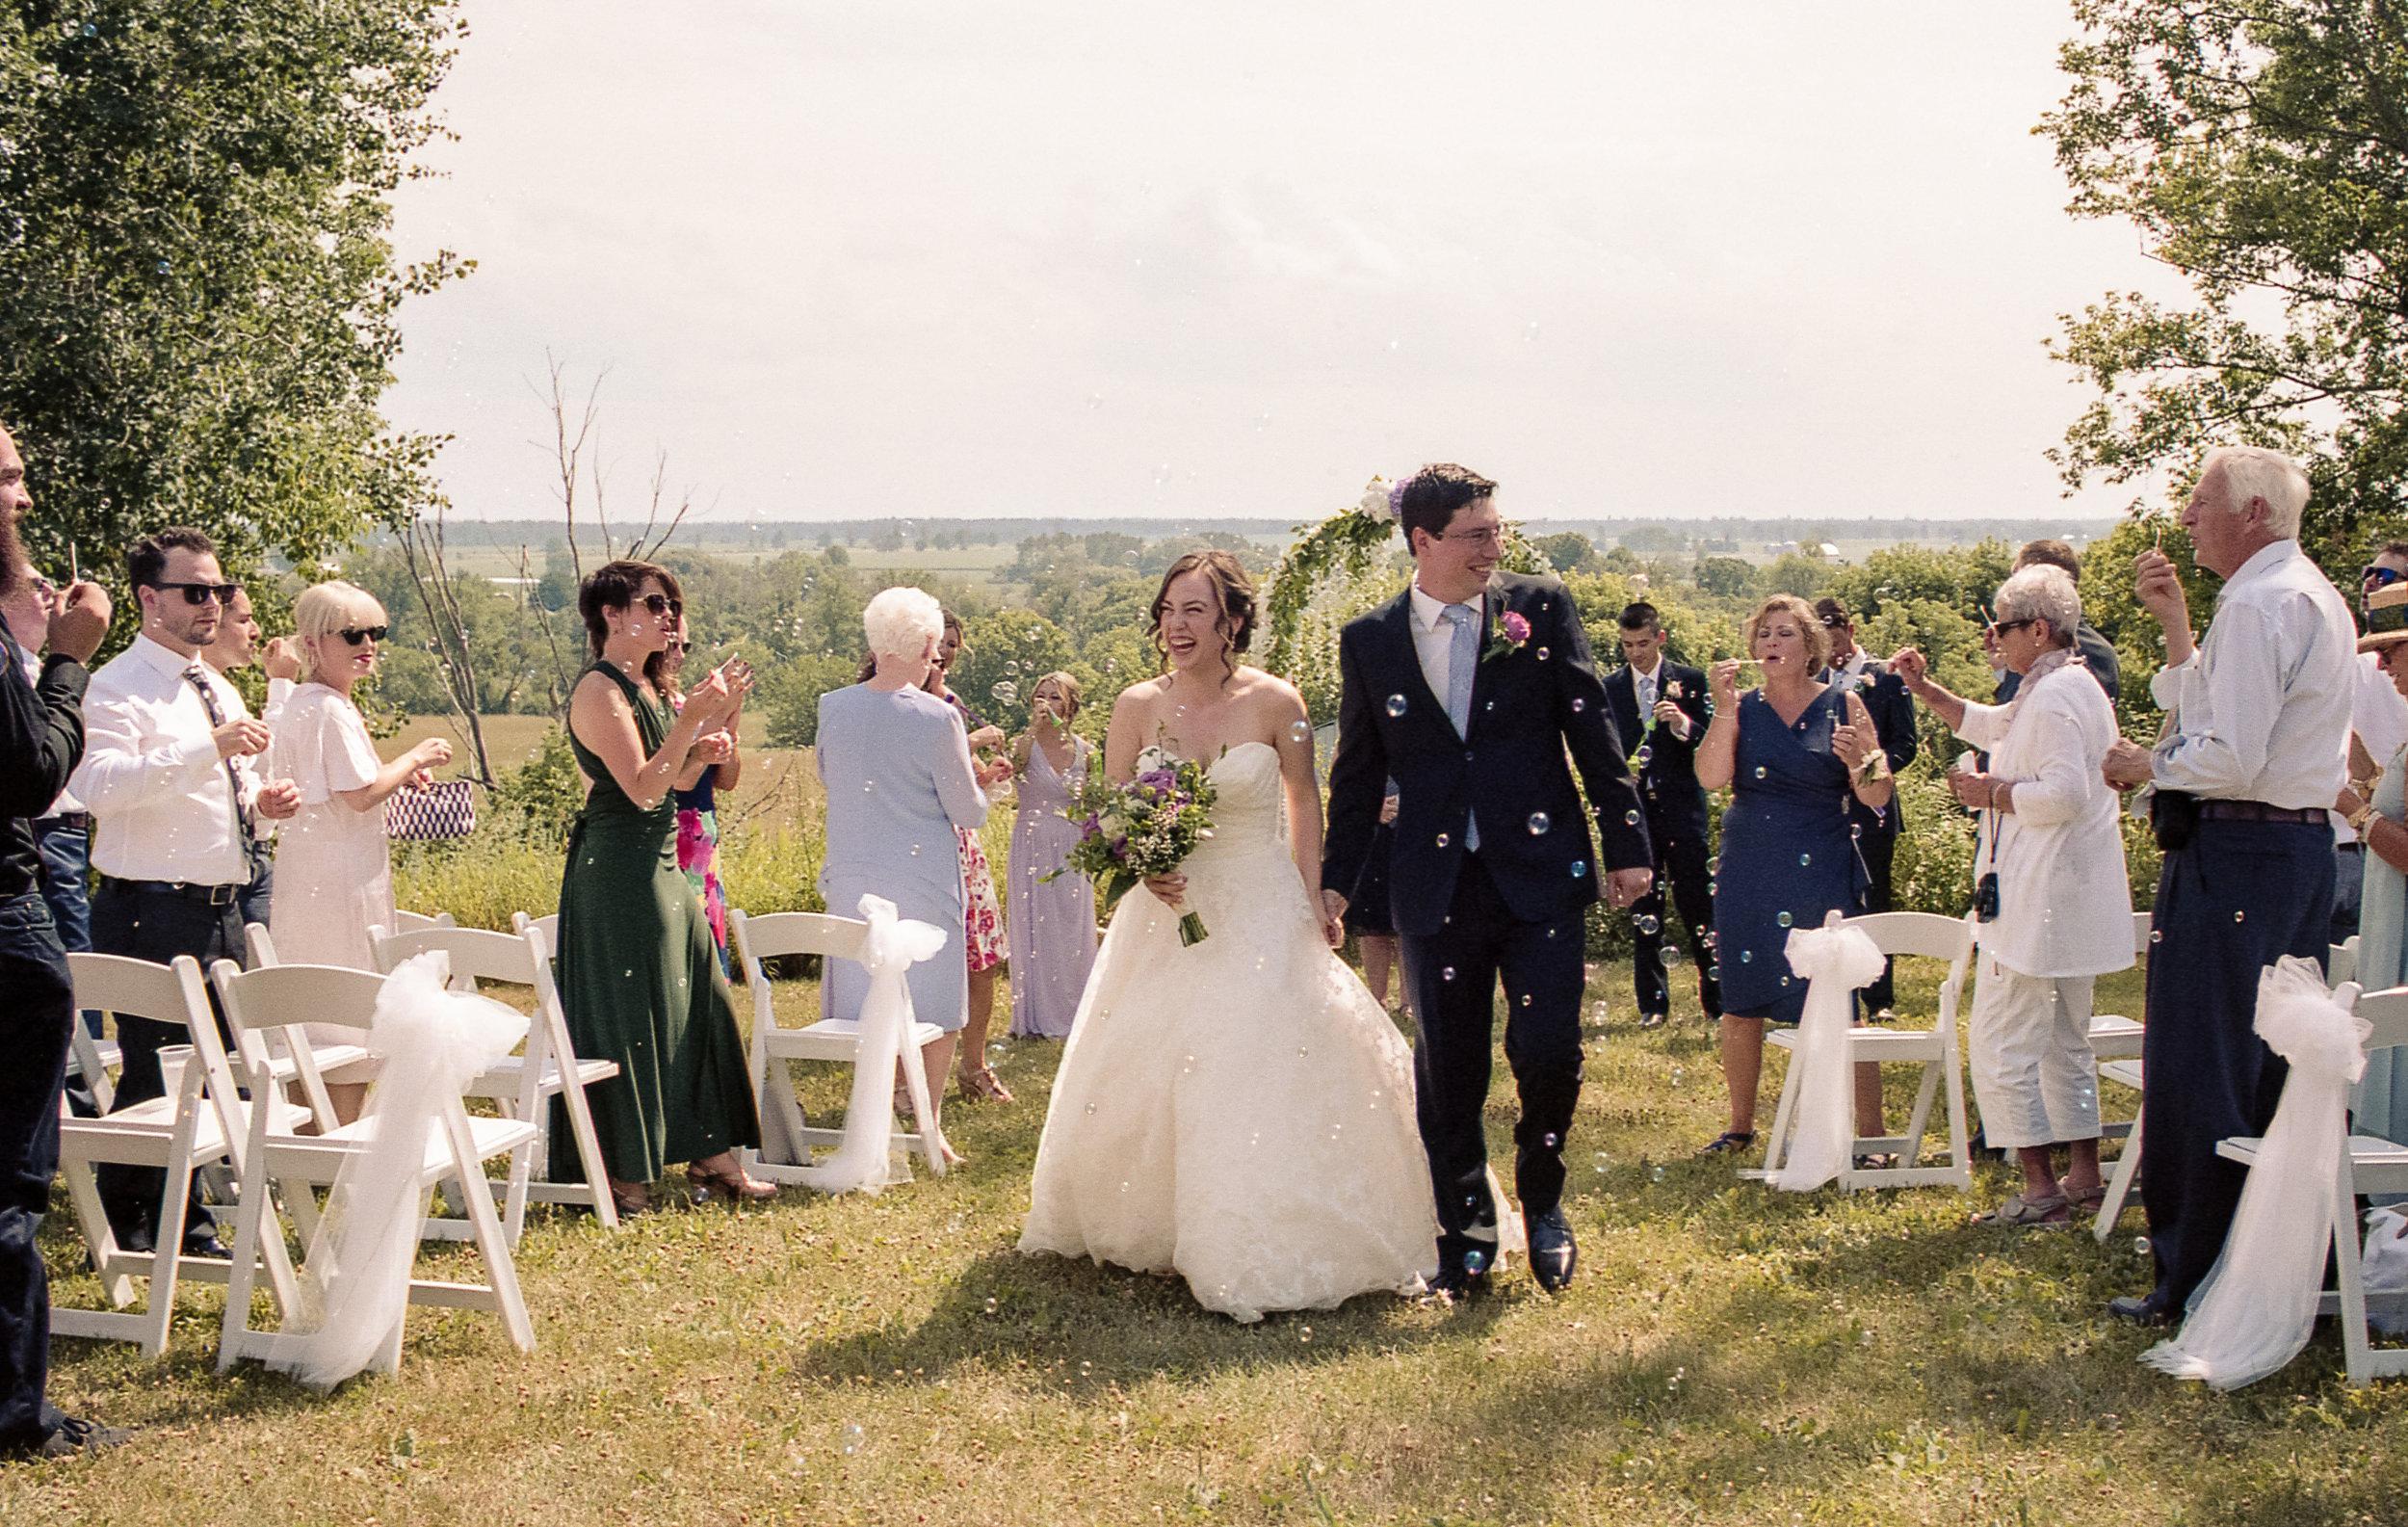 bubbles_wedding_aisle_bride_groom